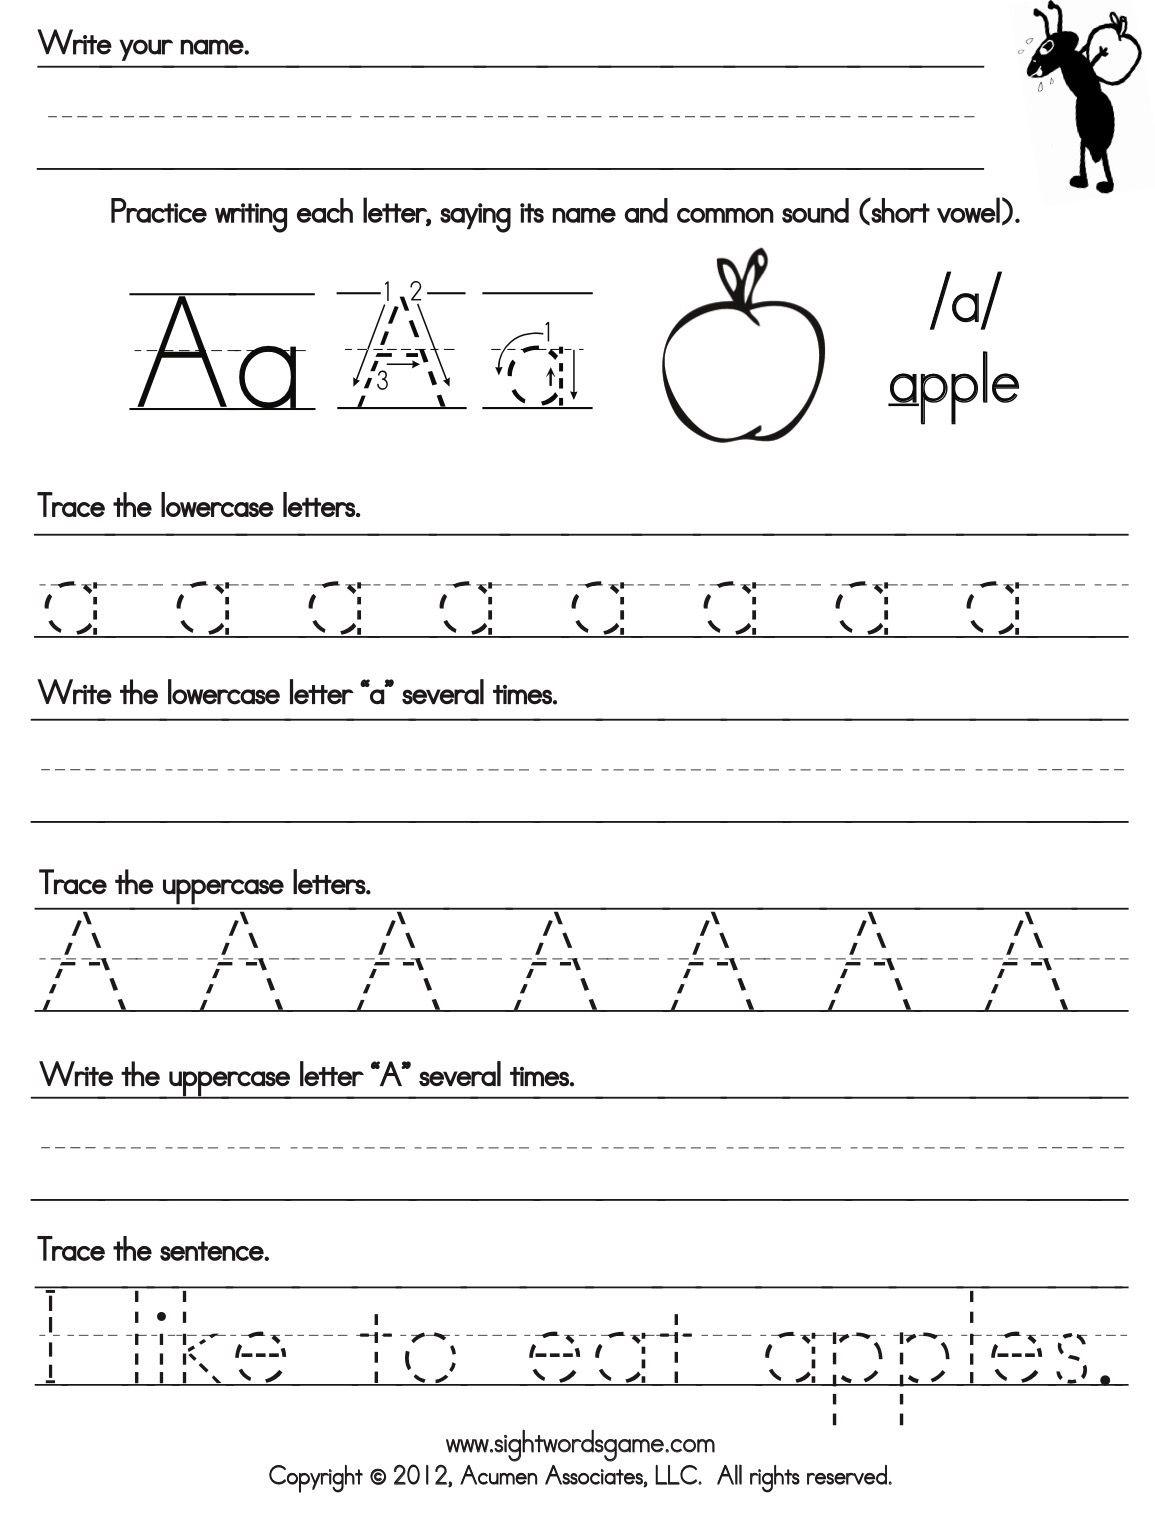 Pin By Jennifer Scott On Kids These Days Writing Worksheets Writing Practice Writing Practice Worksheets